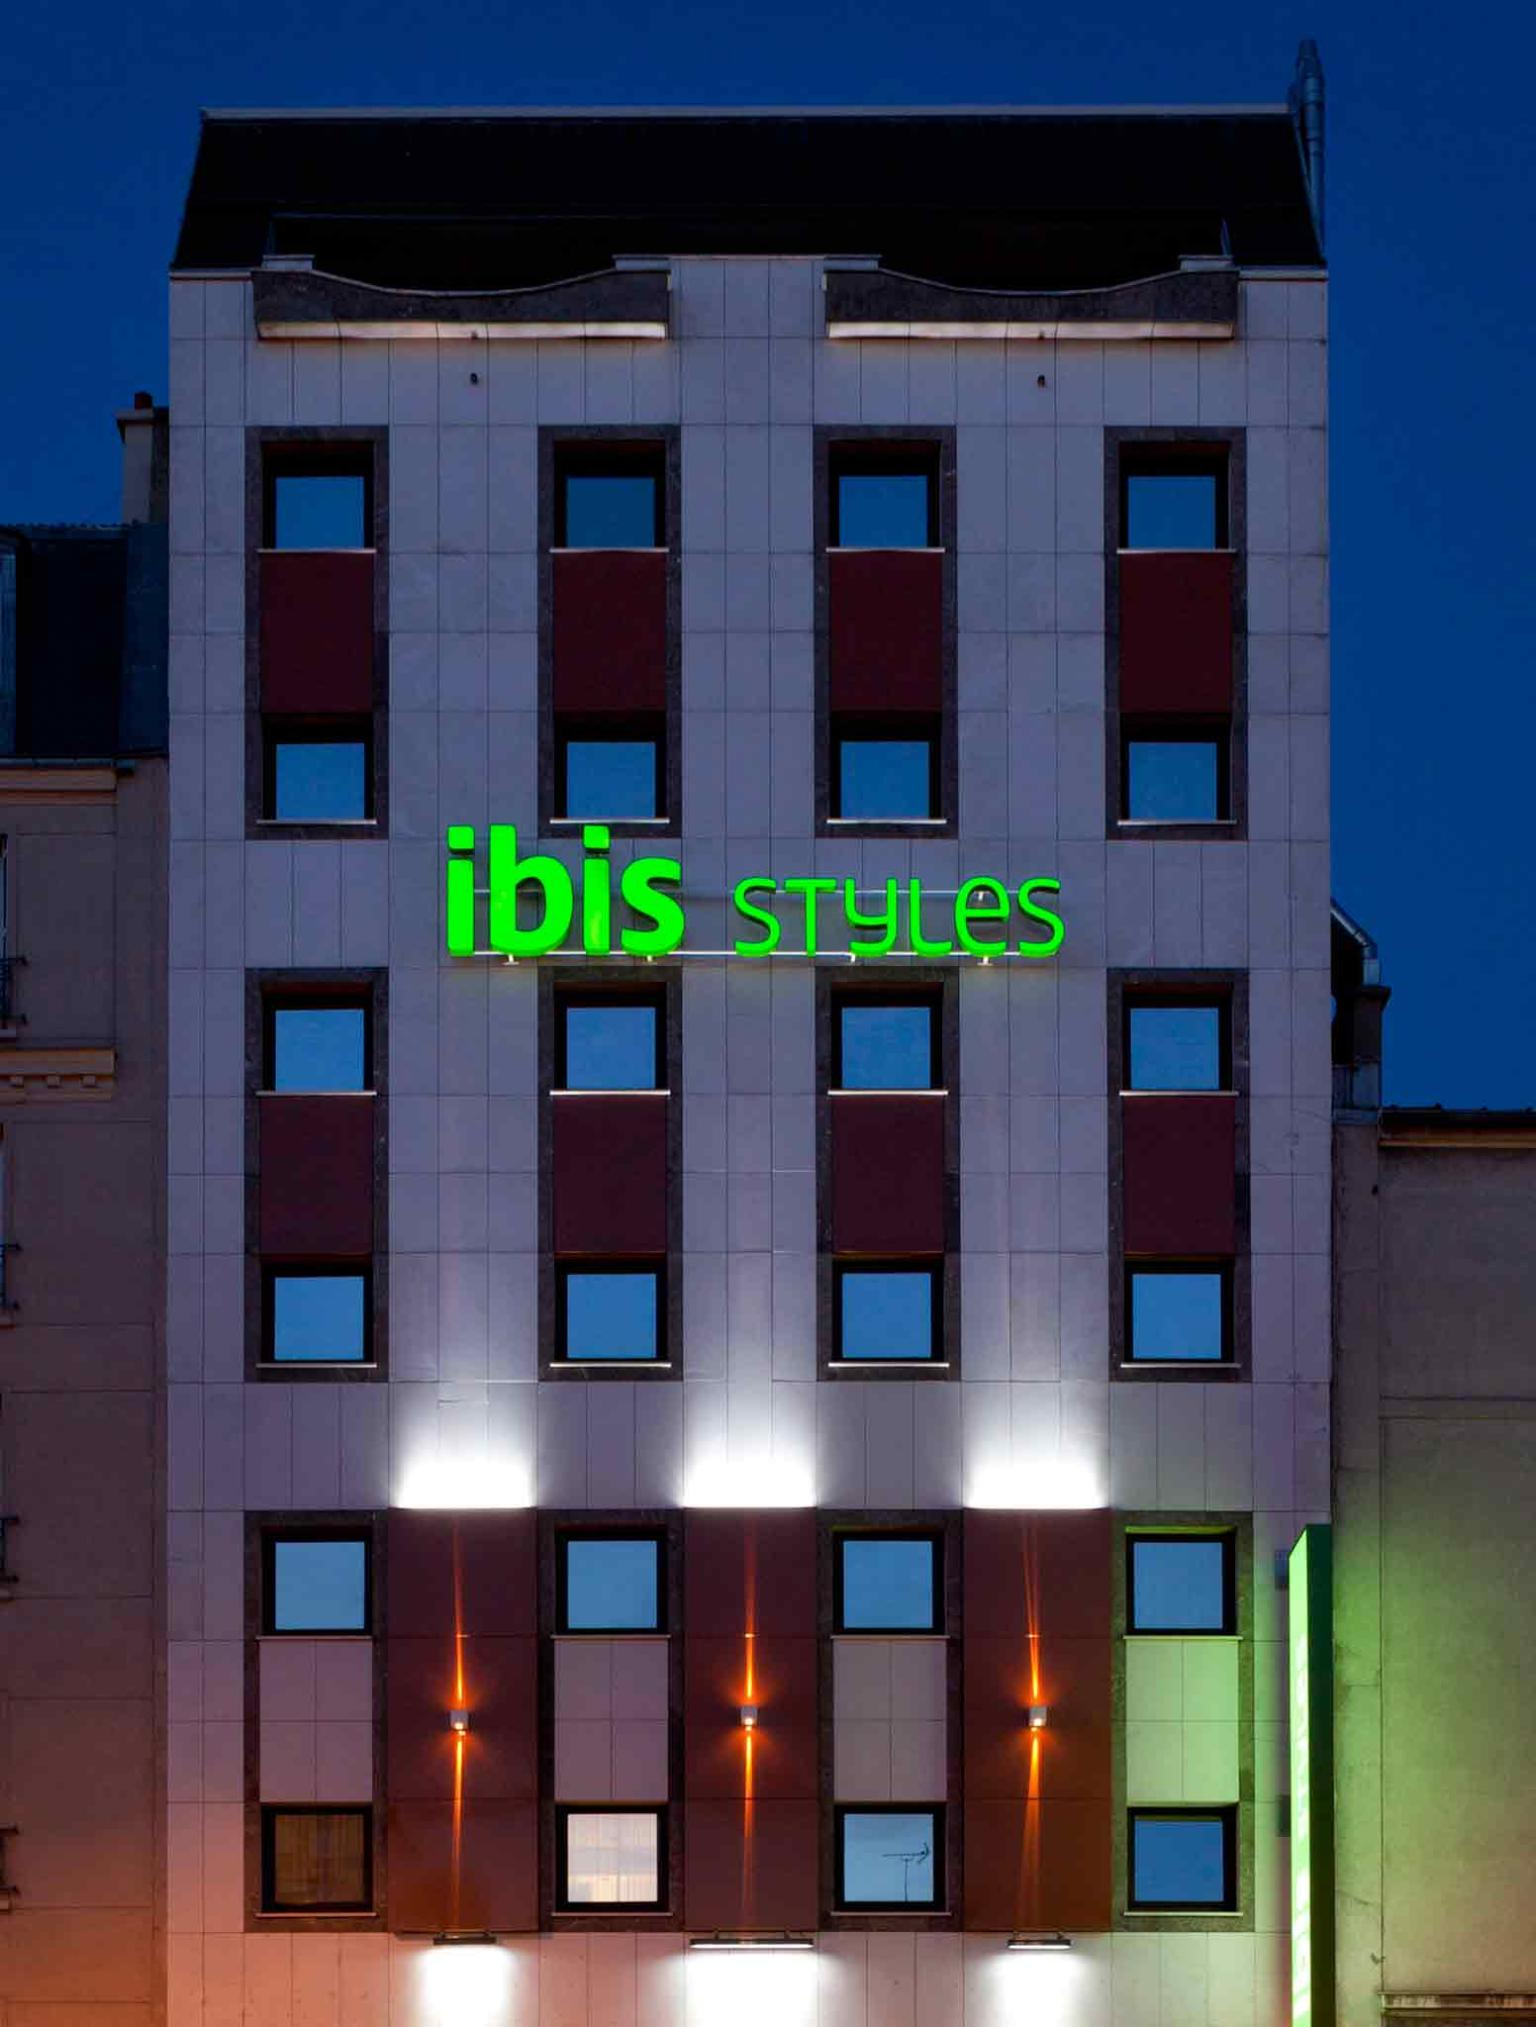 ibis styles porte d orleans h 244 tel 41 avenue aristide briand 92120 montrouge adresse